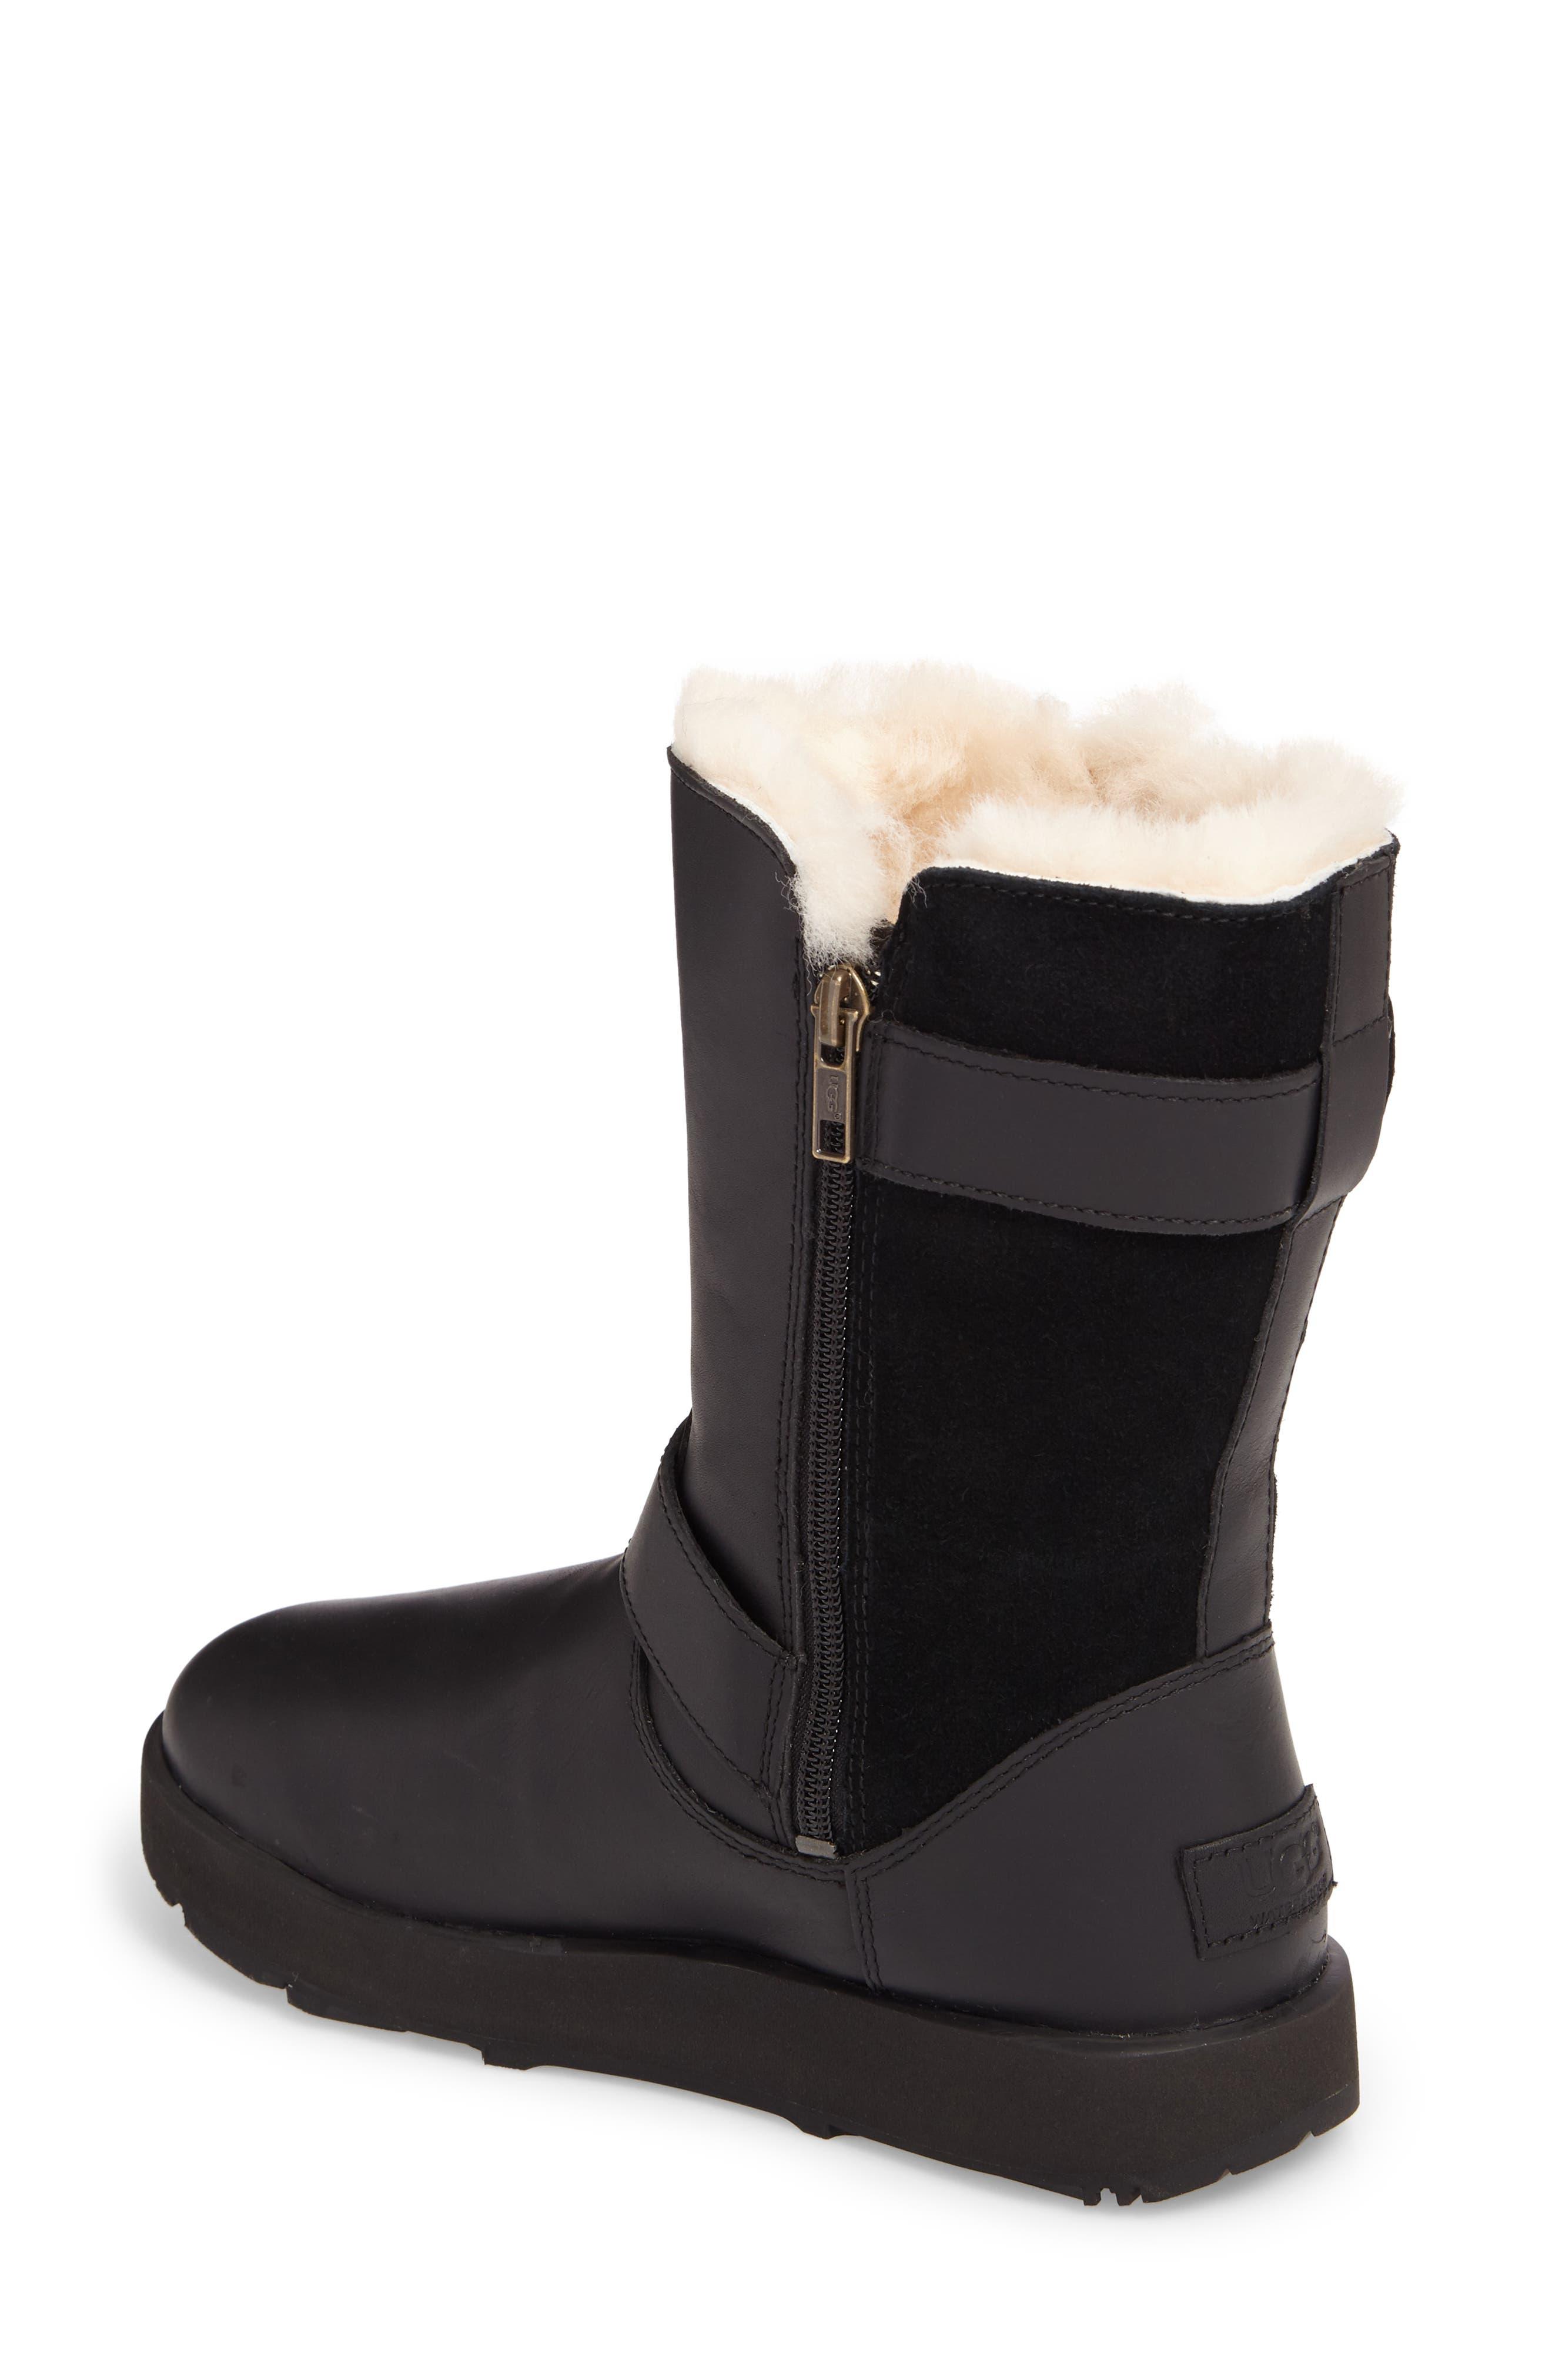 Breida Waterproof Boot,                             Alternate thumbnail 2, color,                             Black Leather